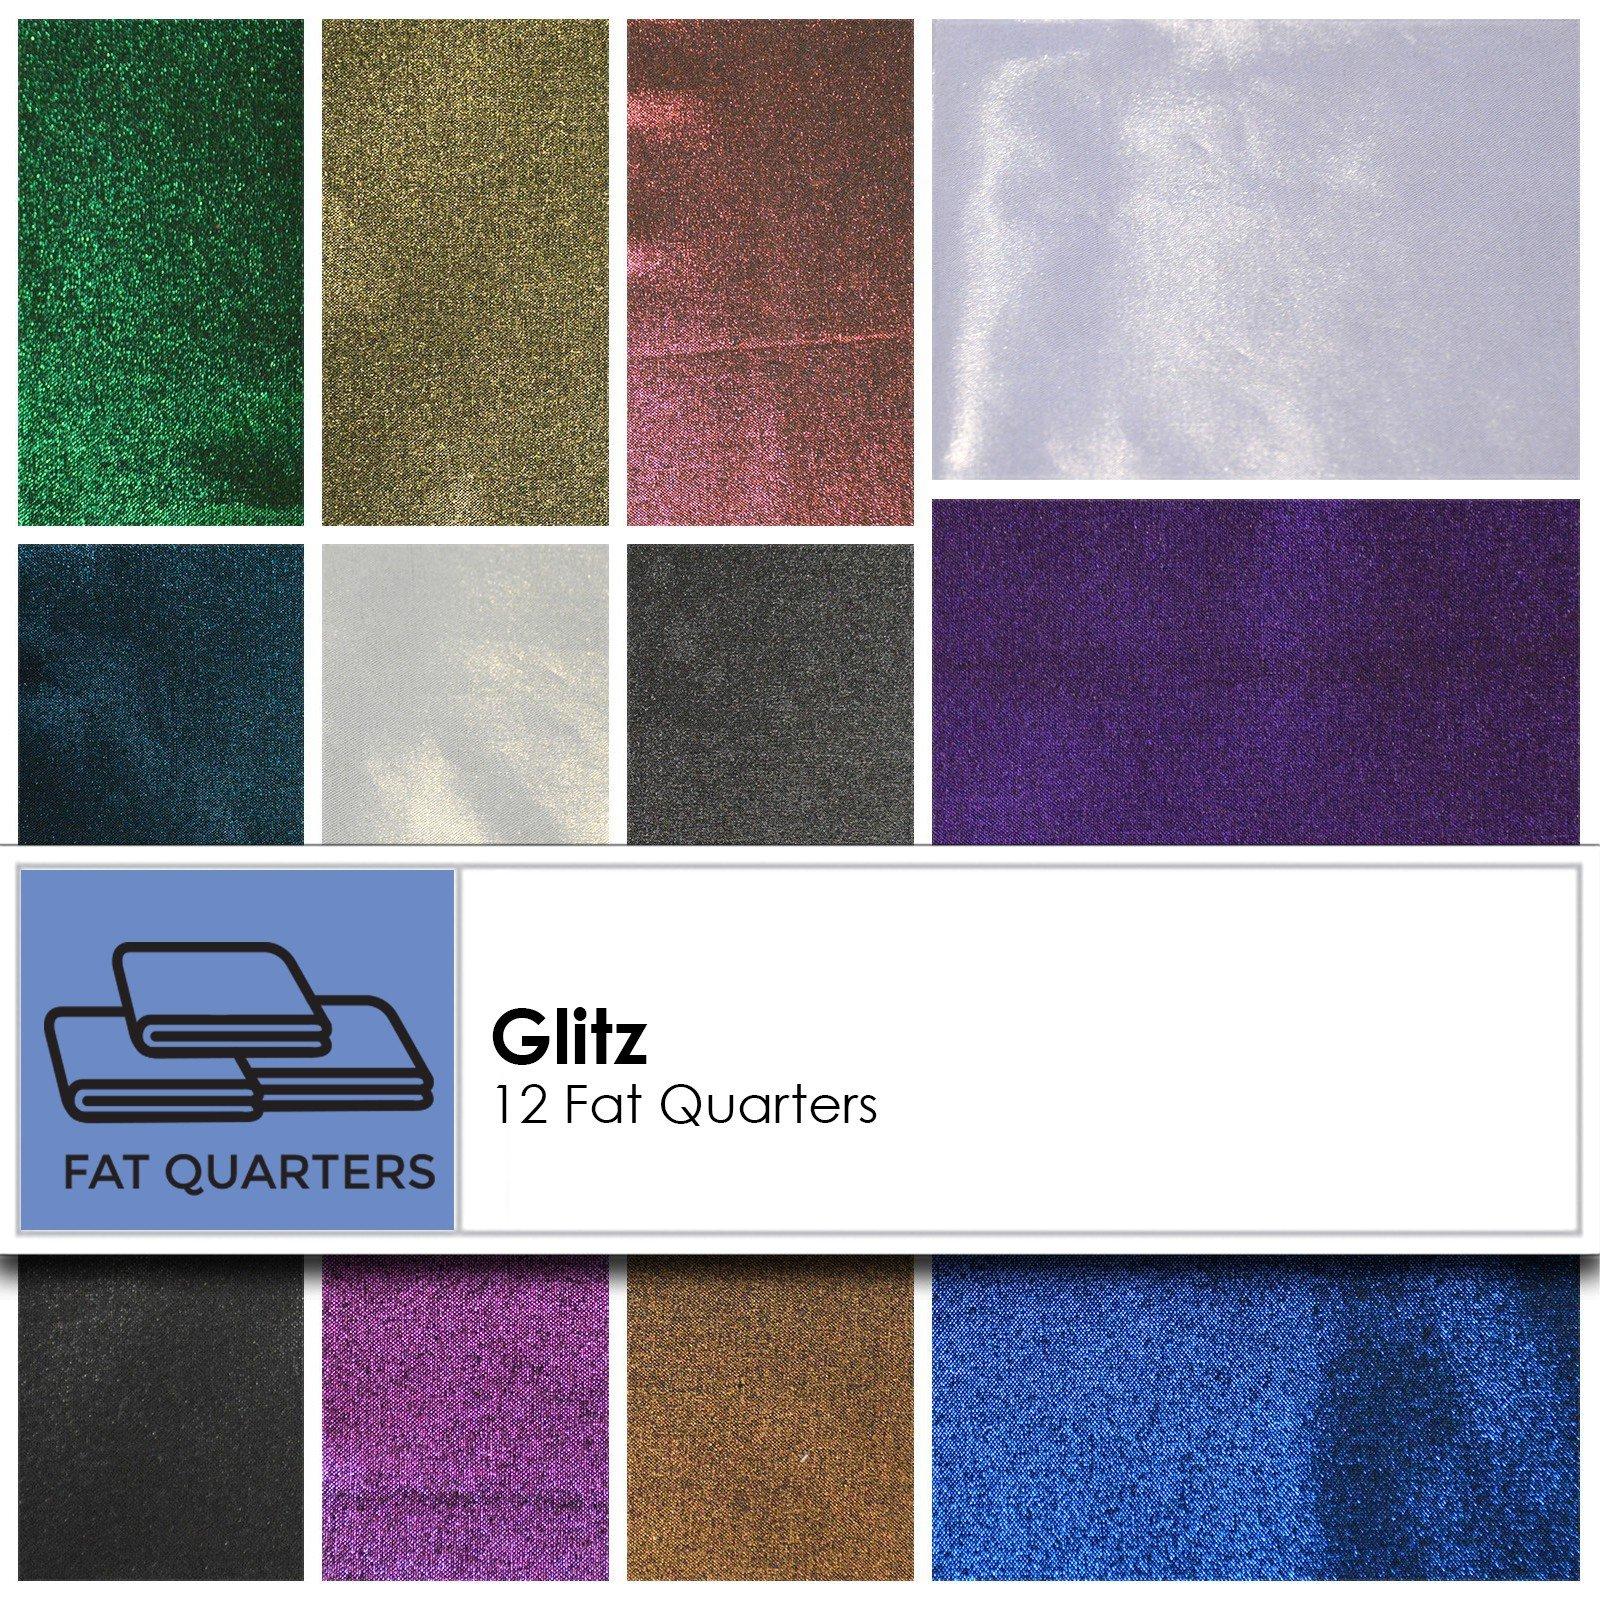 Maywood Studio Glitz Cotton Foil Faced Fabric 12 Piece FQ Bundle